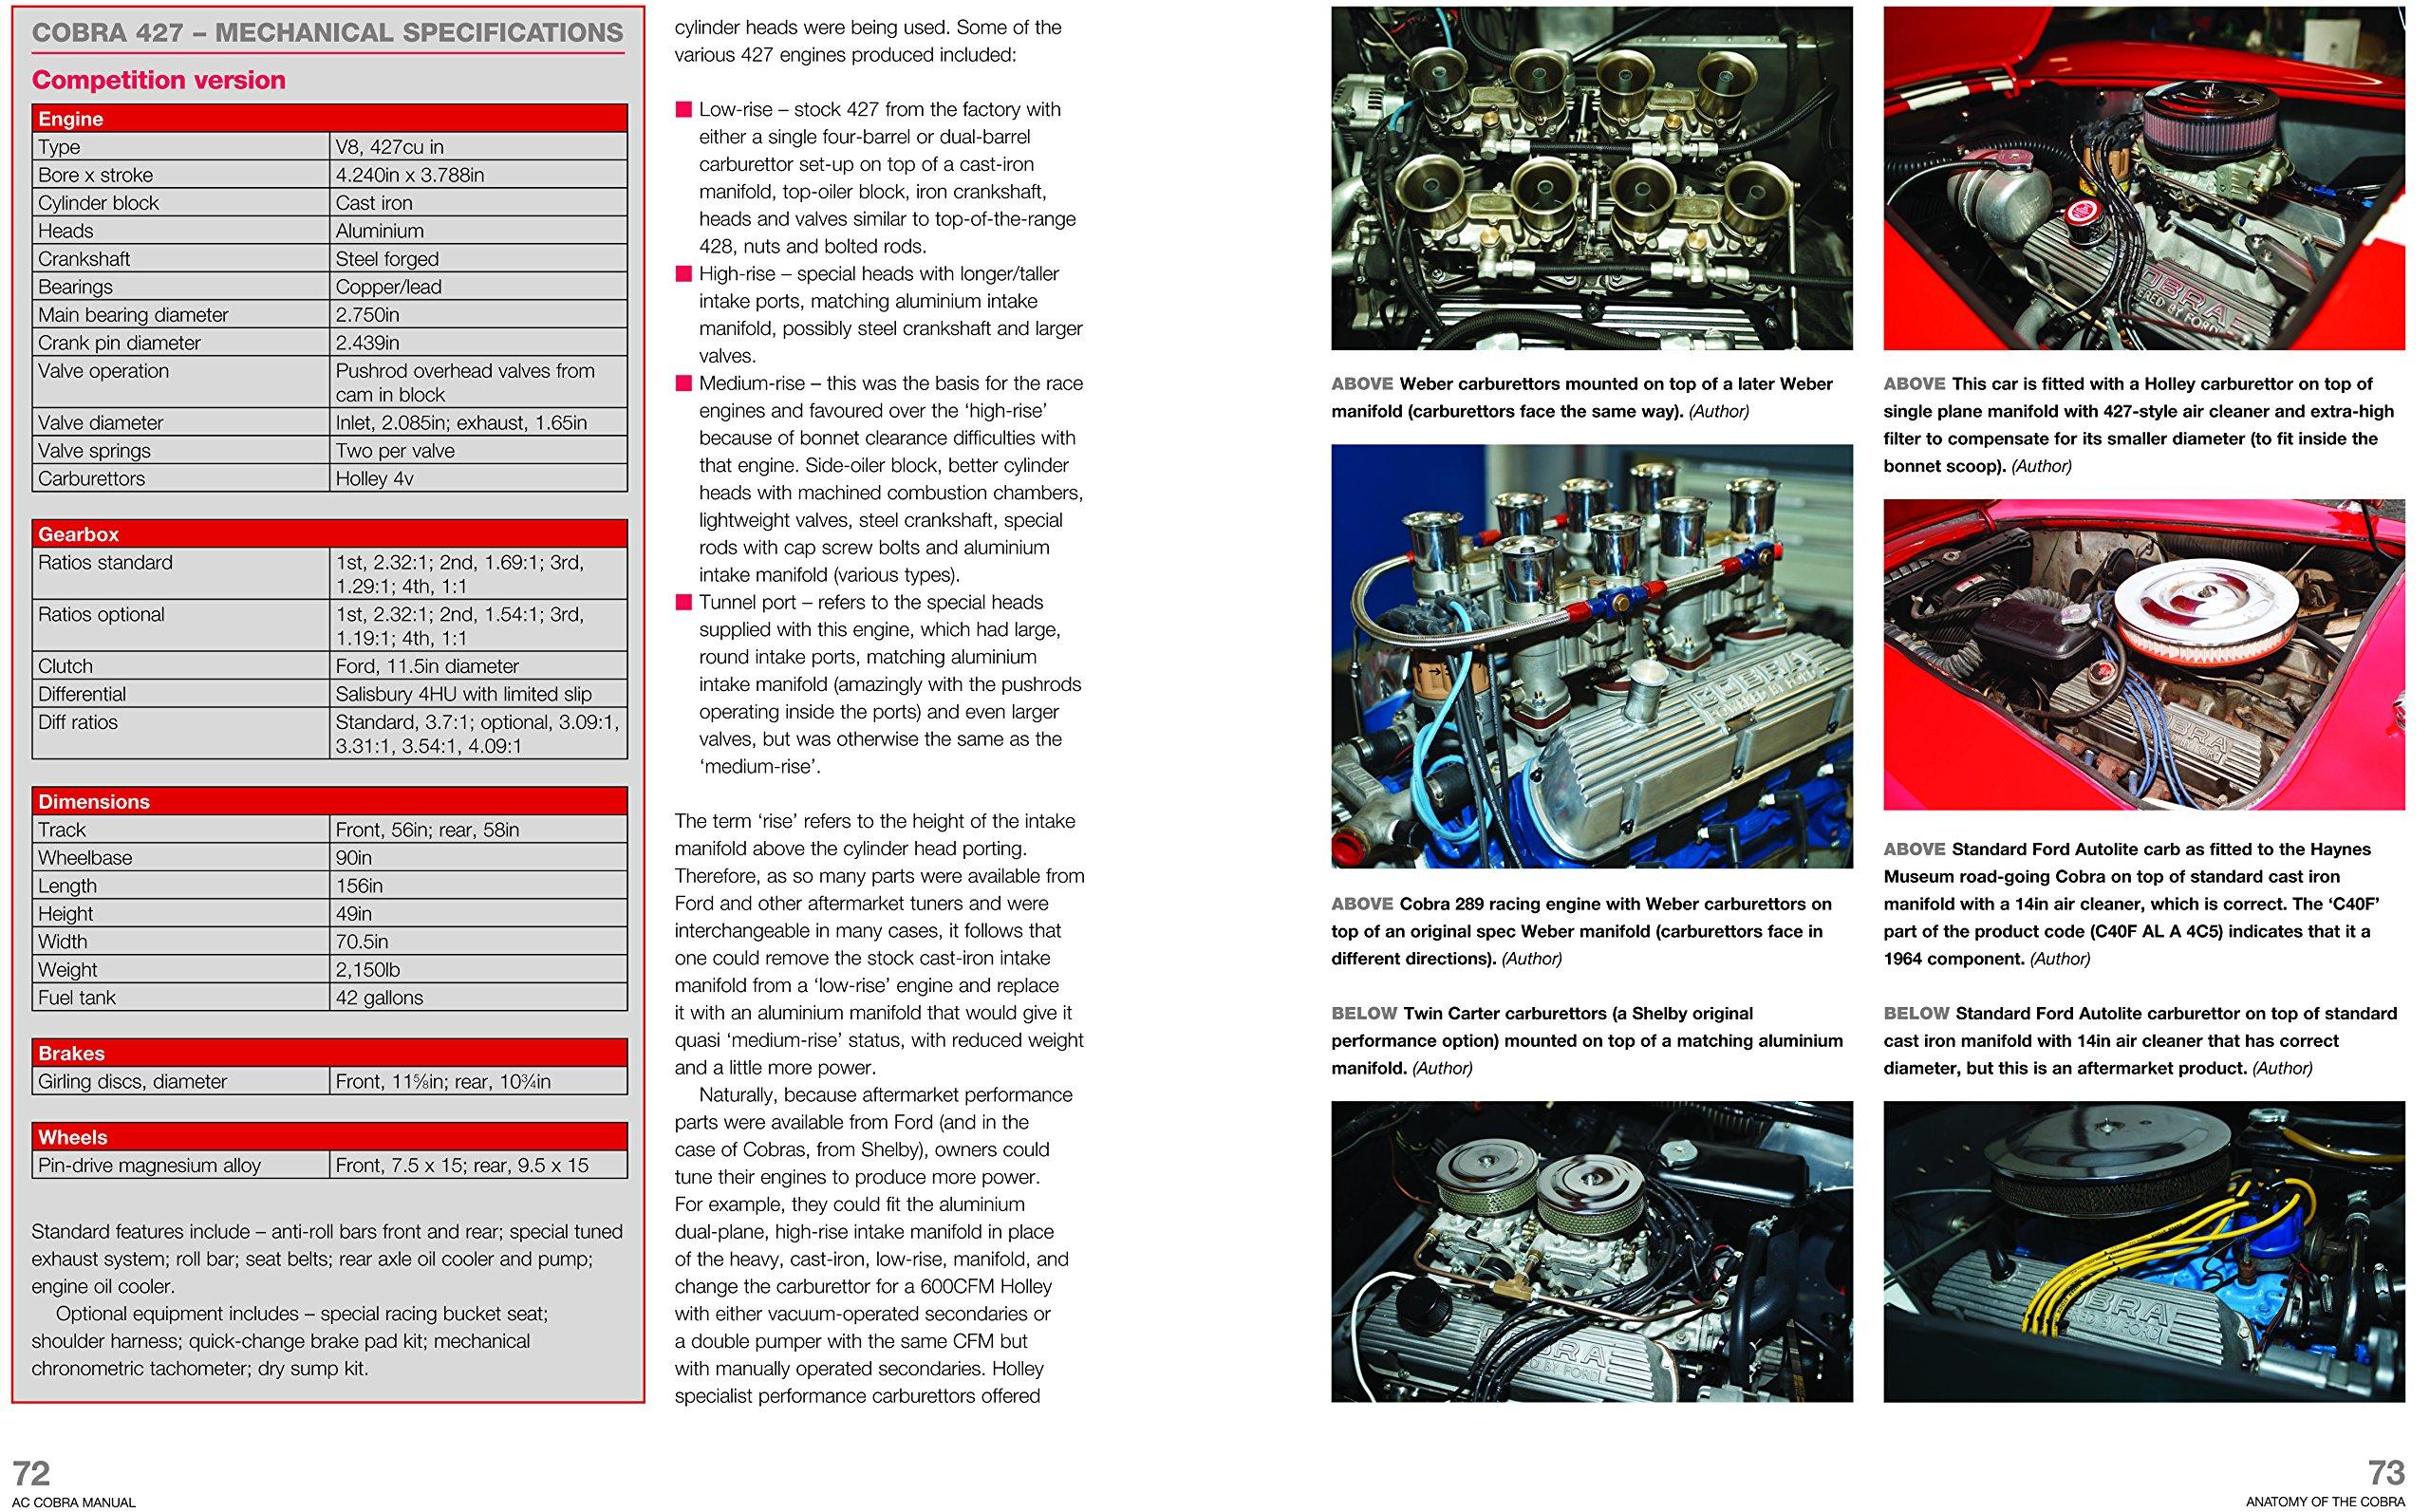 ac shelby cobra 1962 to 1968 all models owners workshop manual rh amazon com Mazda 2.3 Engine Ford Ranger 2.3 Liter Engine